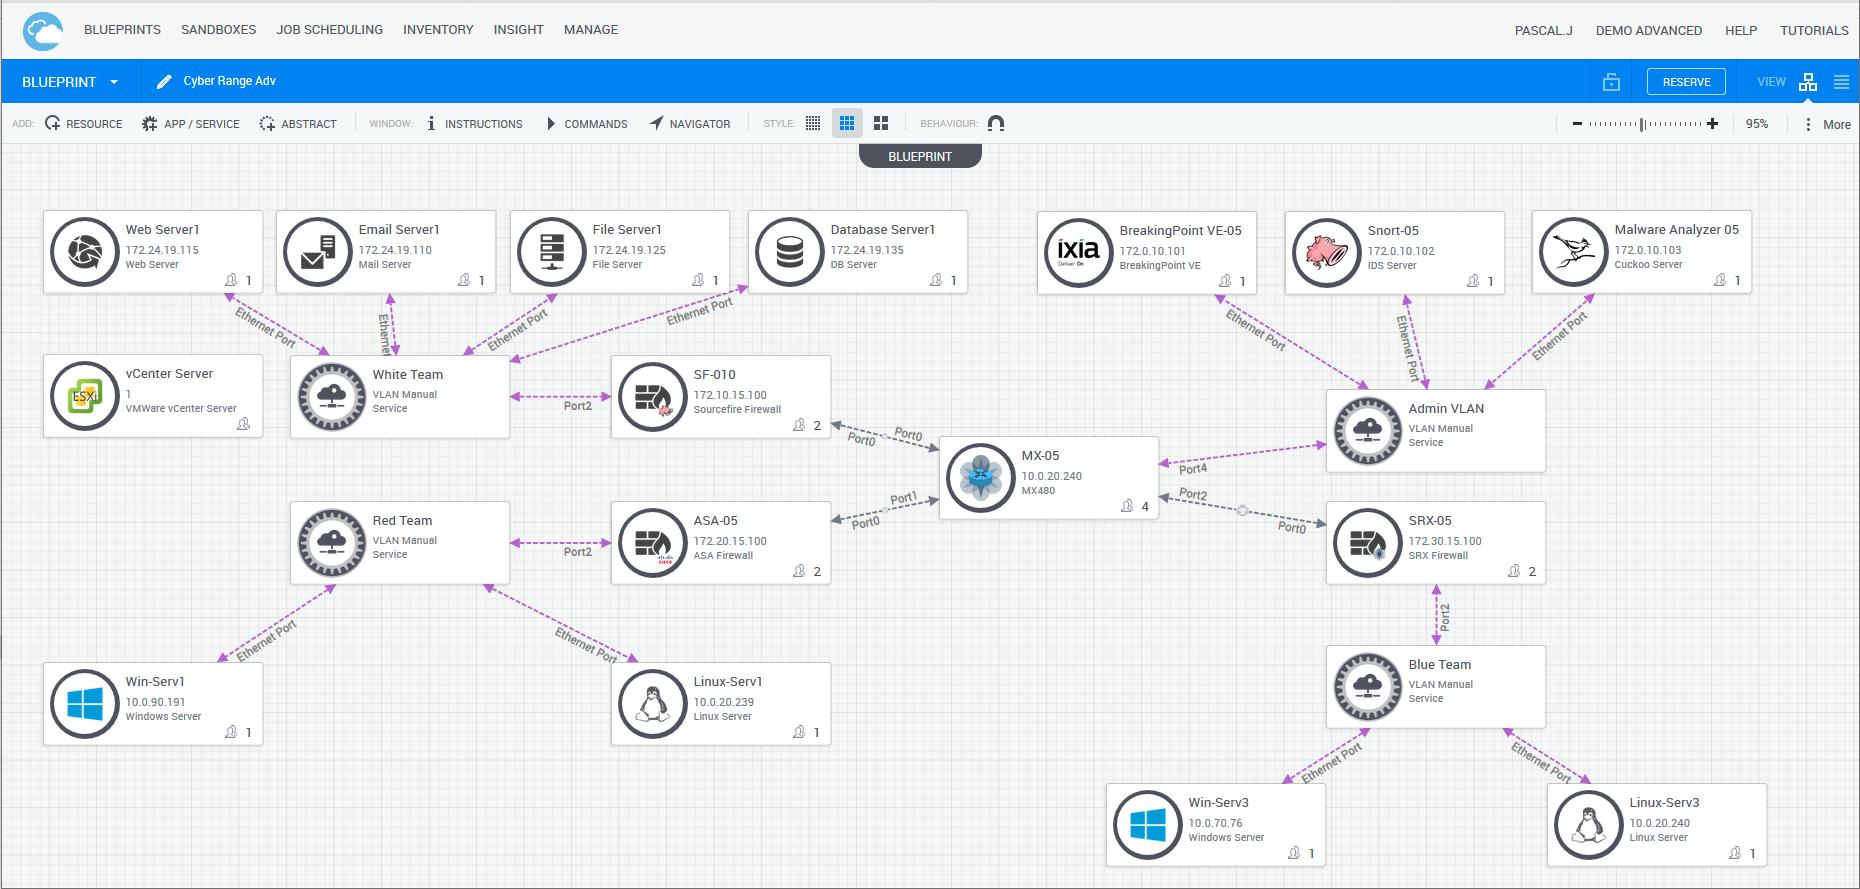 cloudshell-workspace-blueprint-catalog-cyber-range